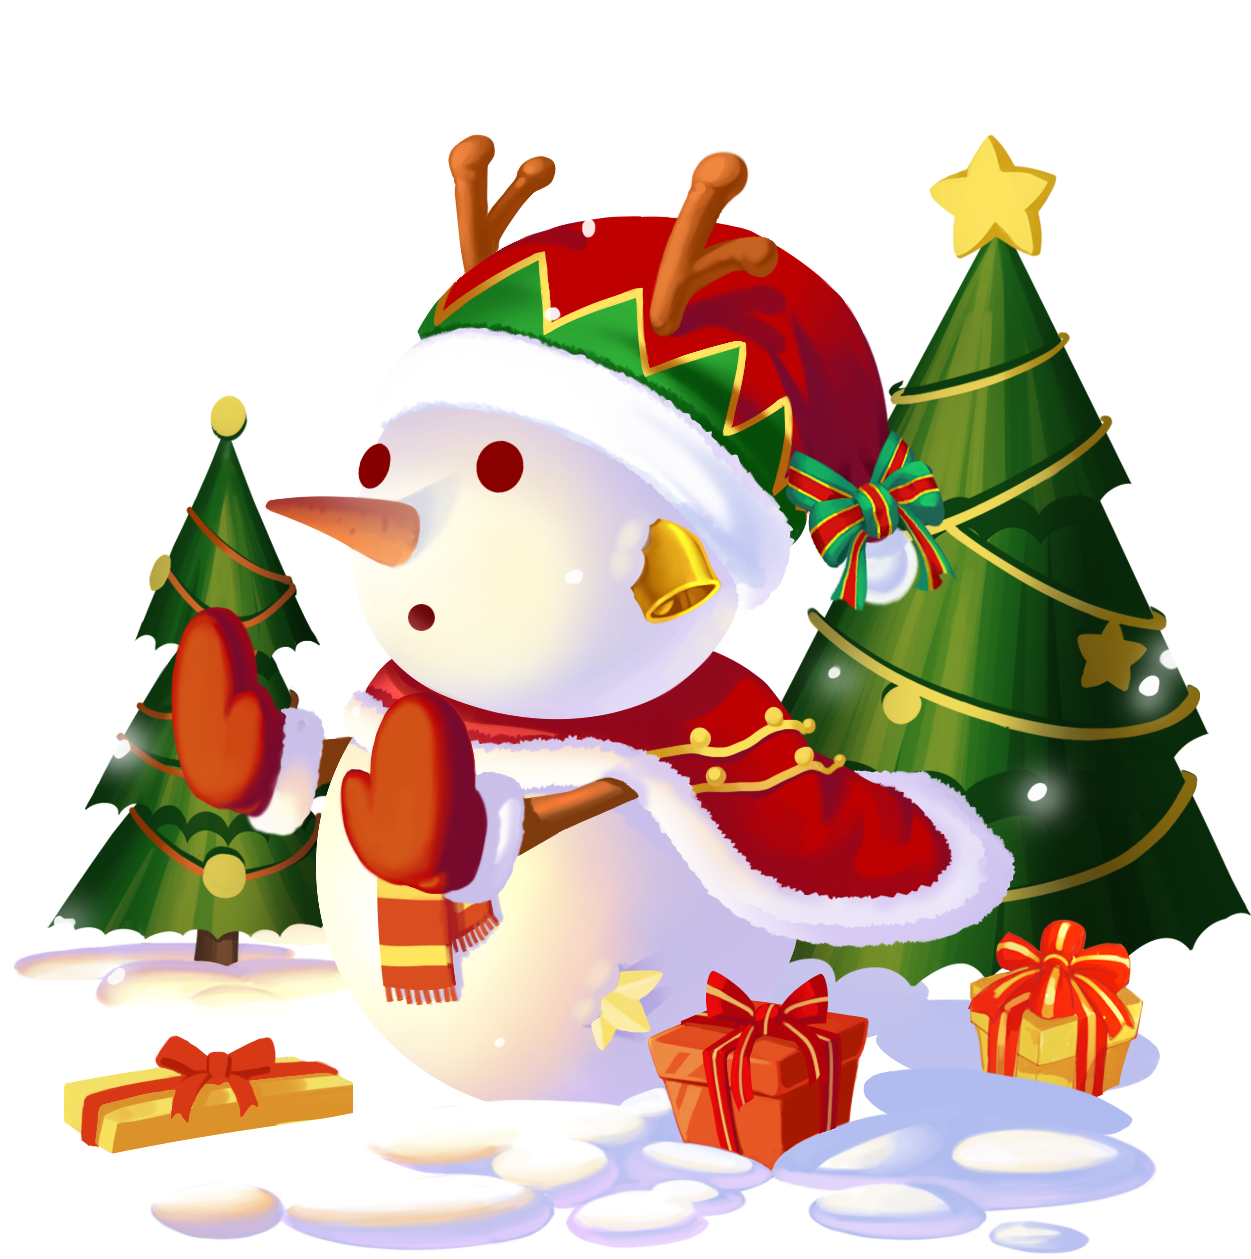 Qy软软✨莱恩陪玩收到礼物圣诞雪人